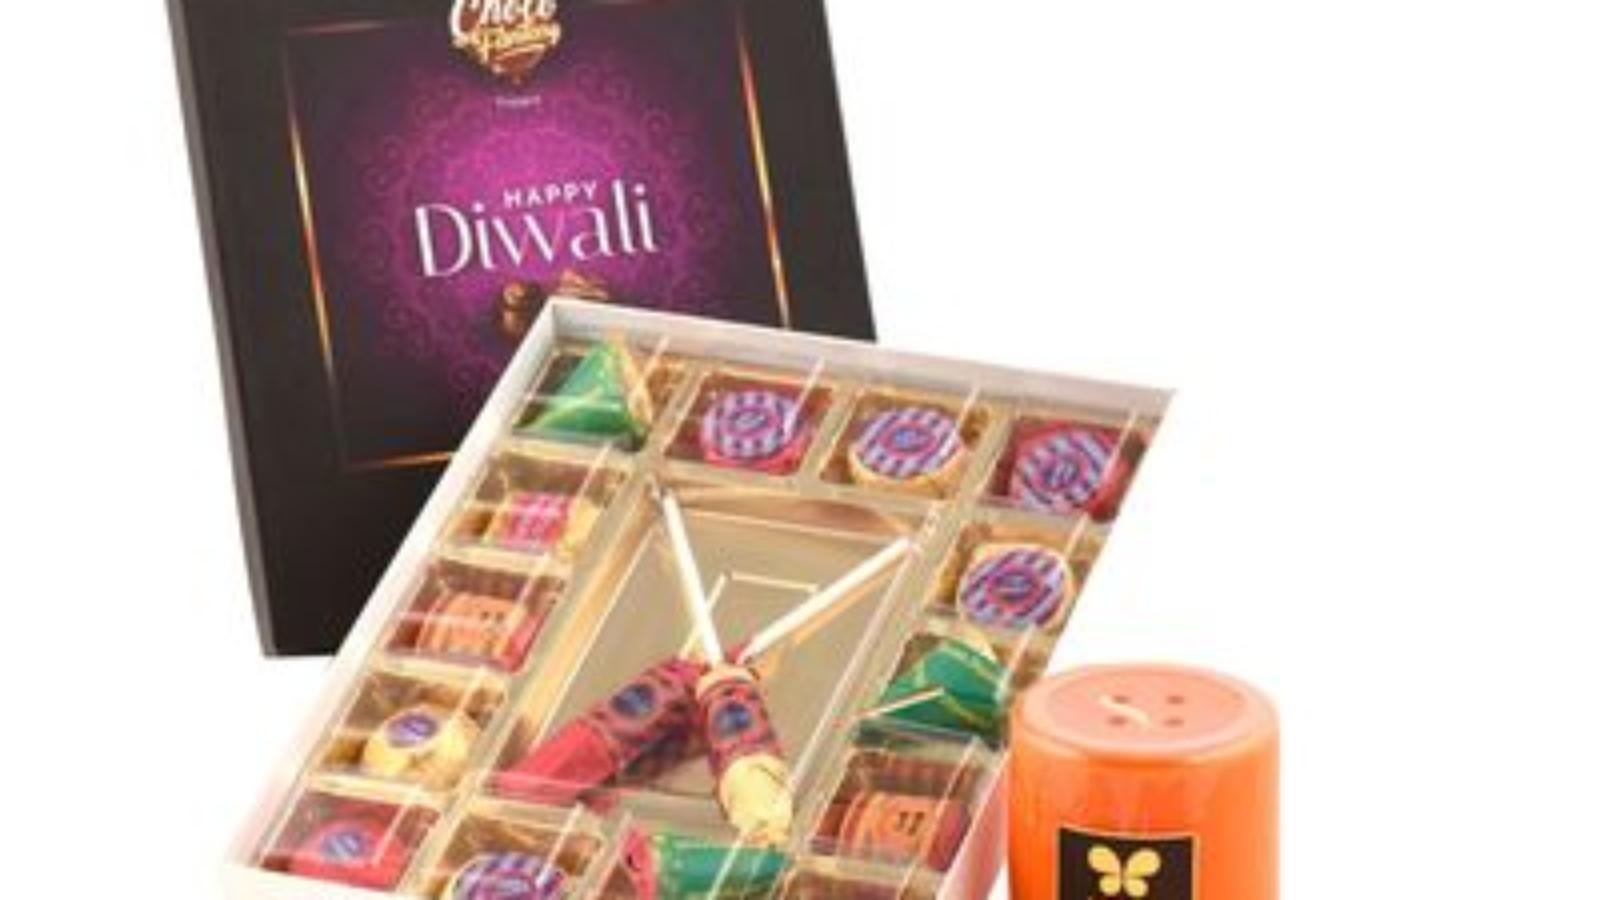 Diwali Specialised Chocolates Gift Boxes